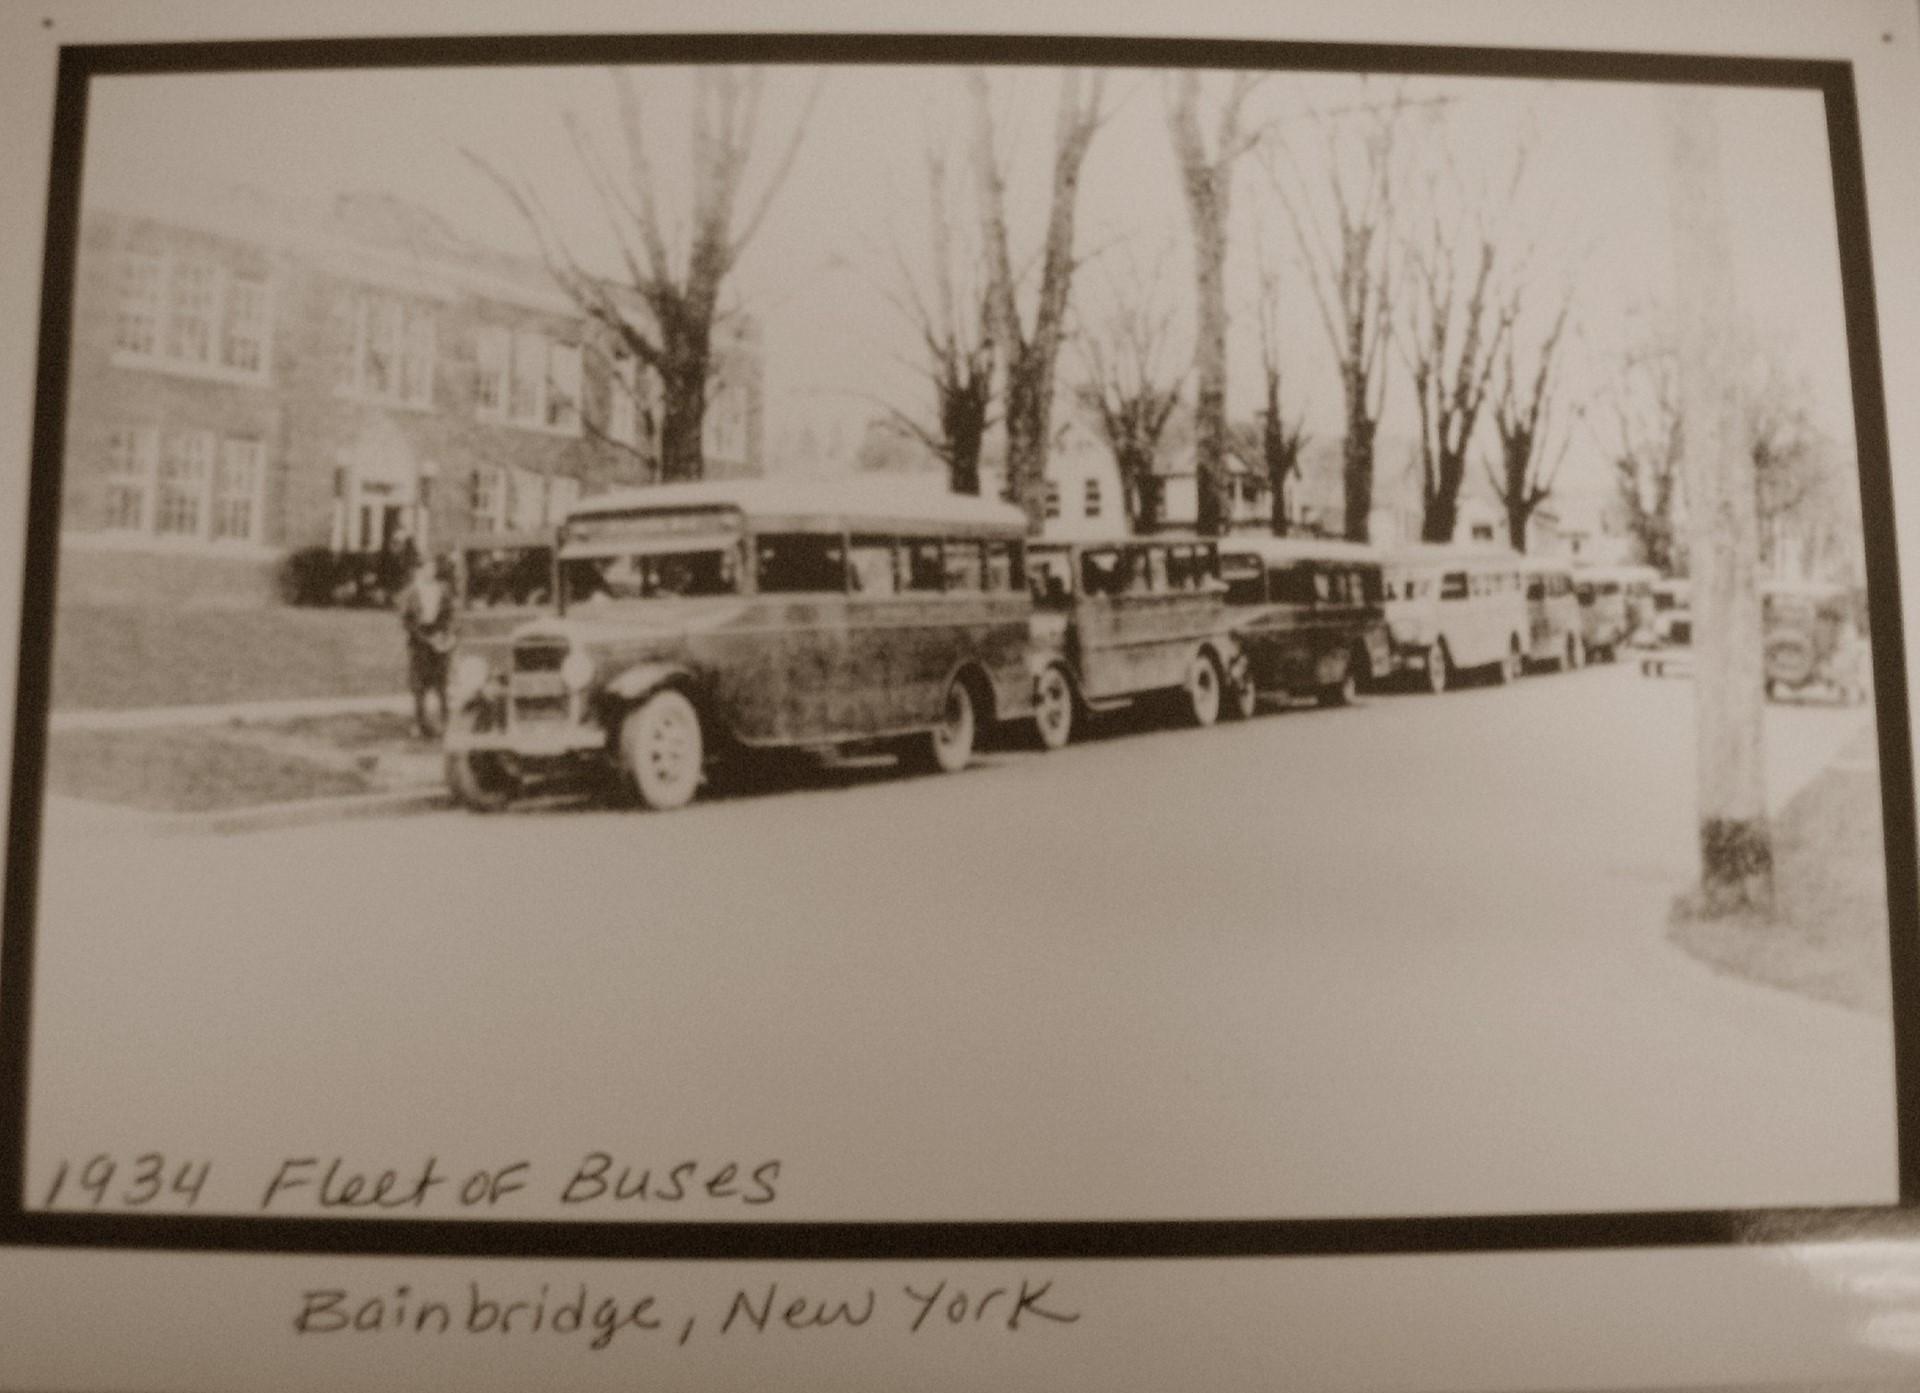 Fleet of Buses - 1934